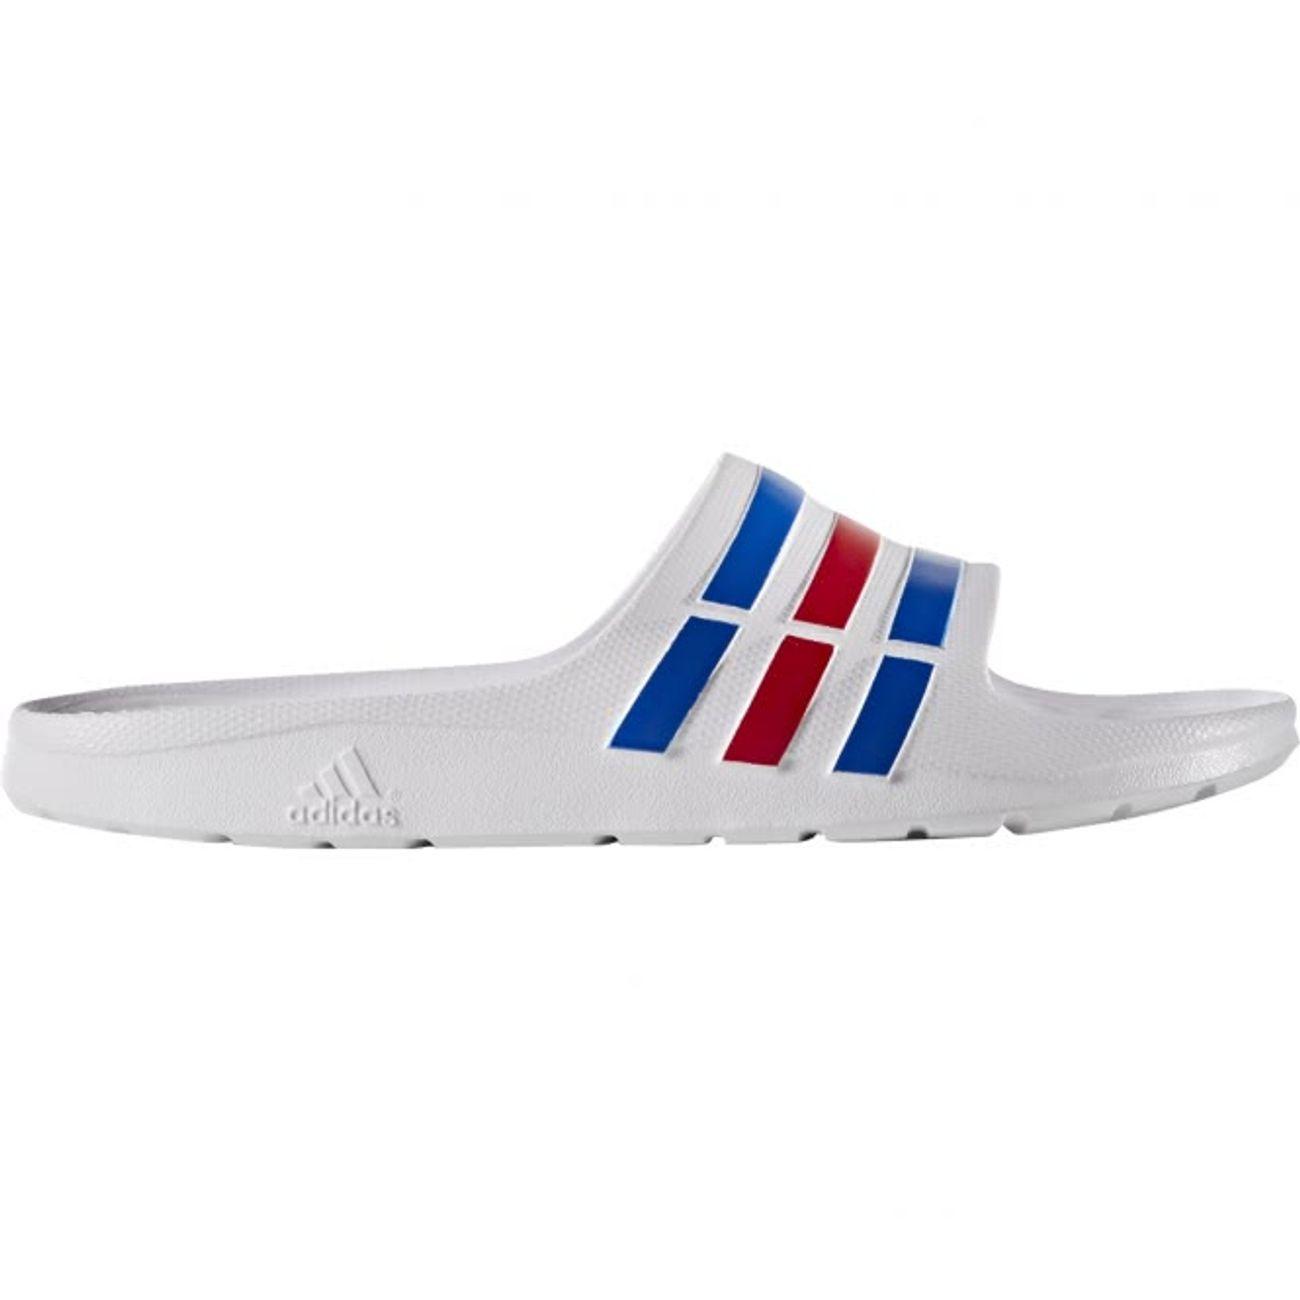 reputable site b3ec9 3557f homme ADIDAS Adidas - Duramo Slide flipflops pour hommes (blanc bleu)